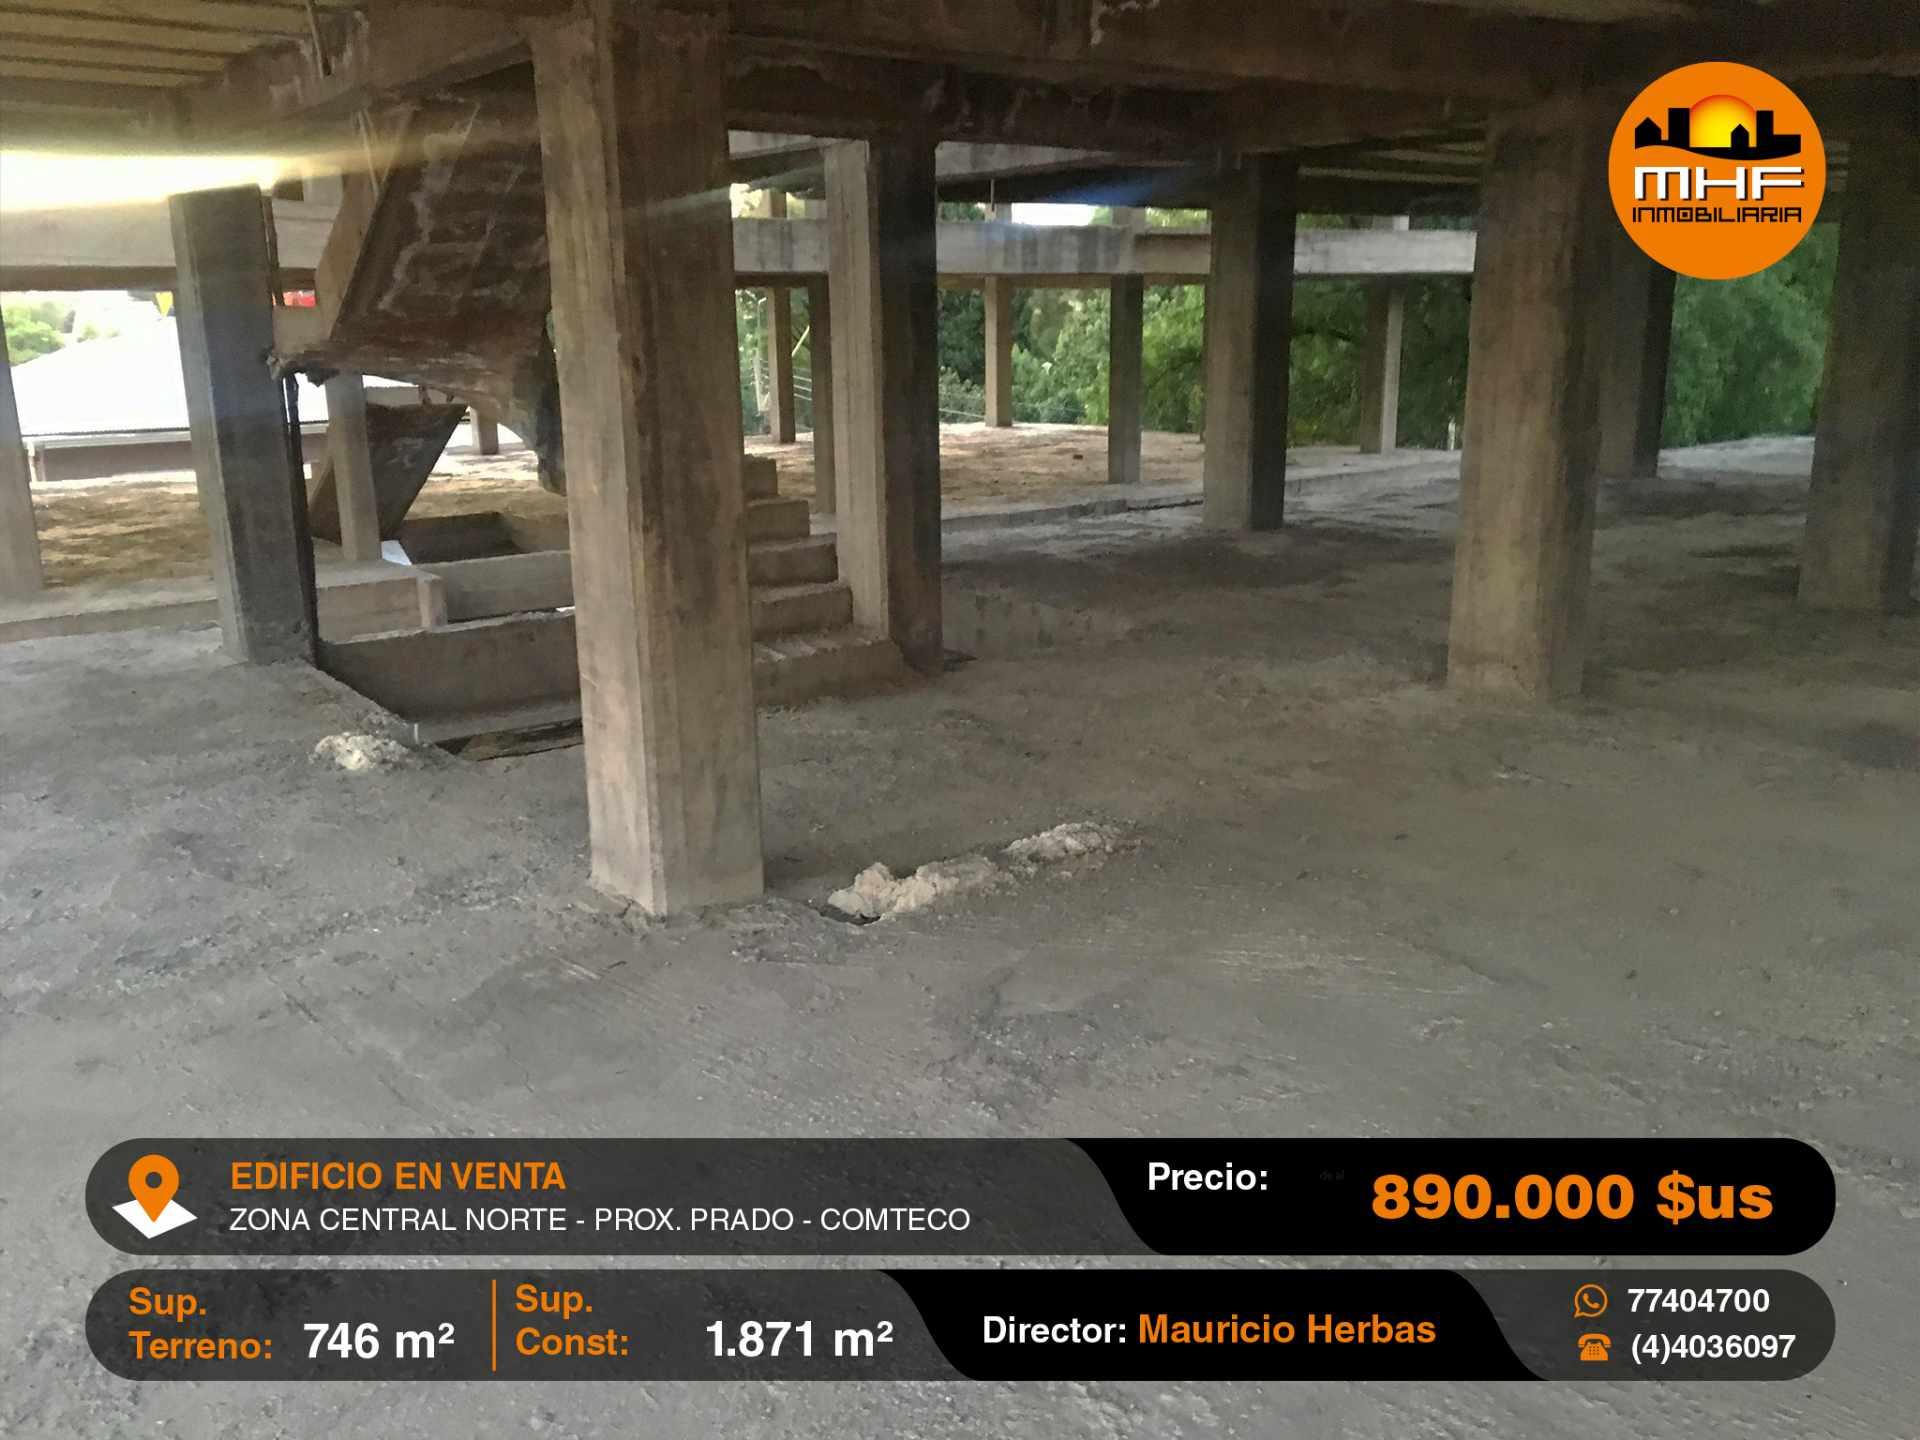 Edificio en Venta PROXIMO PRADO - COMTECO Foto 3